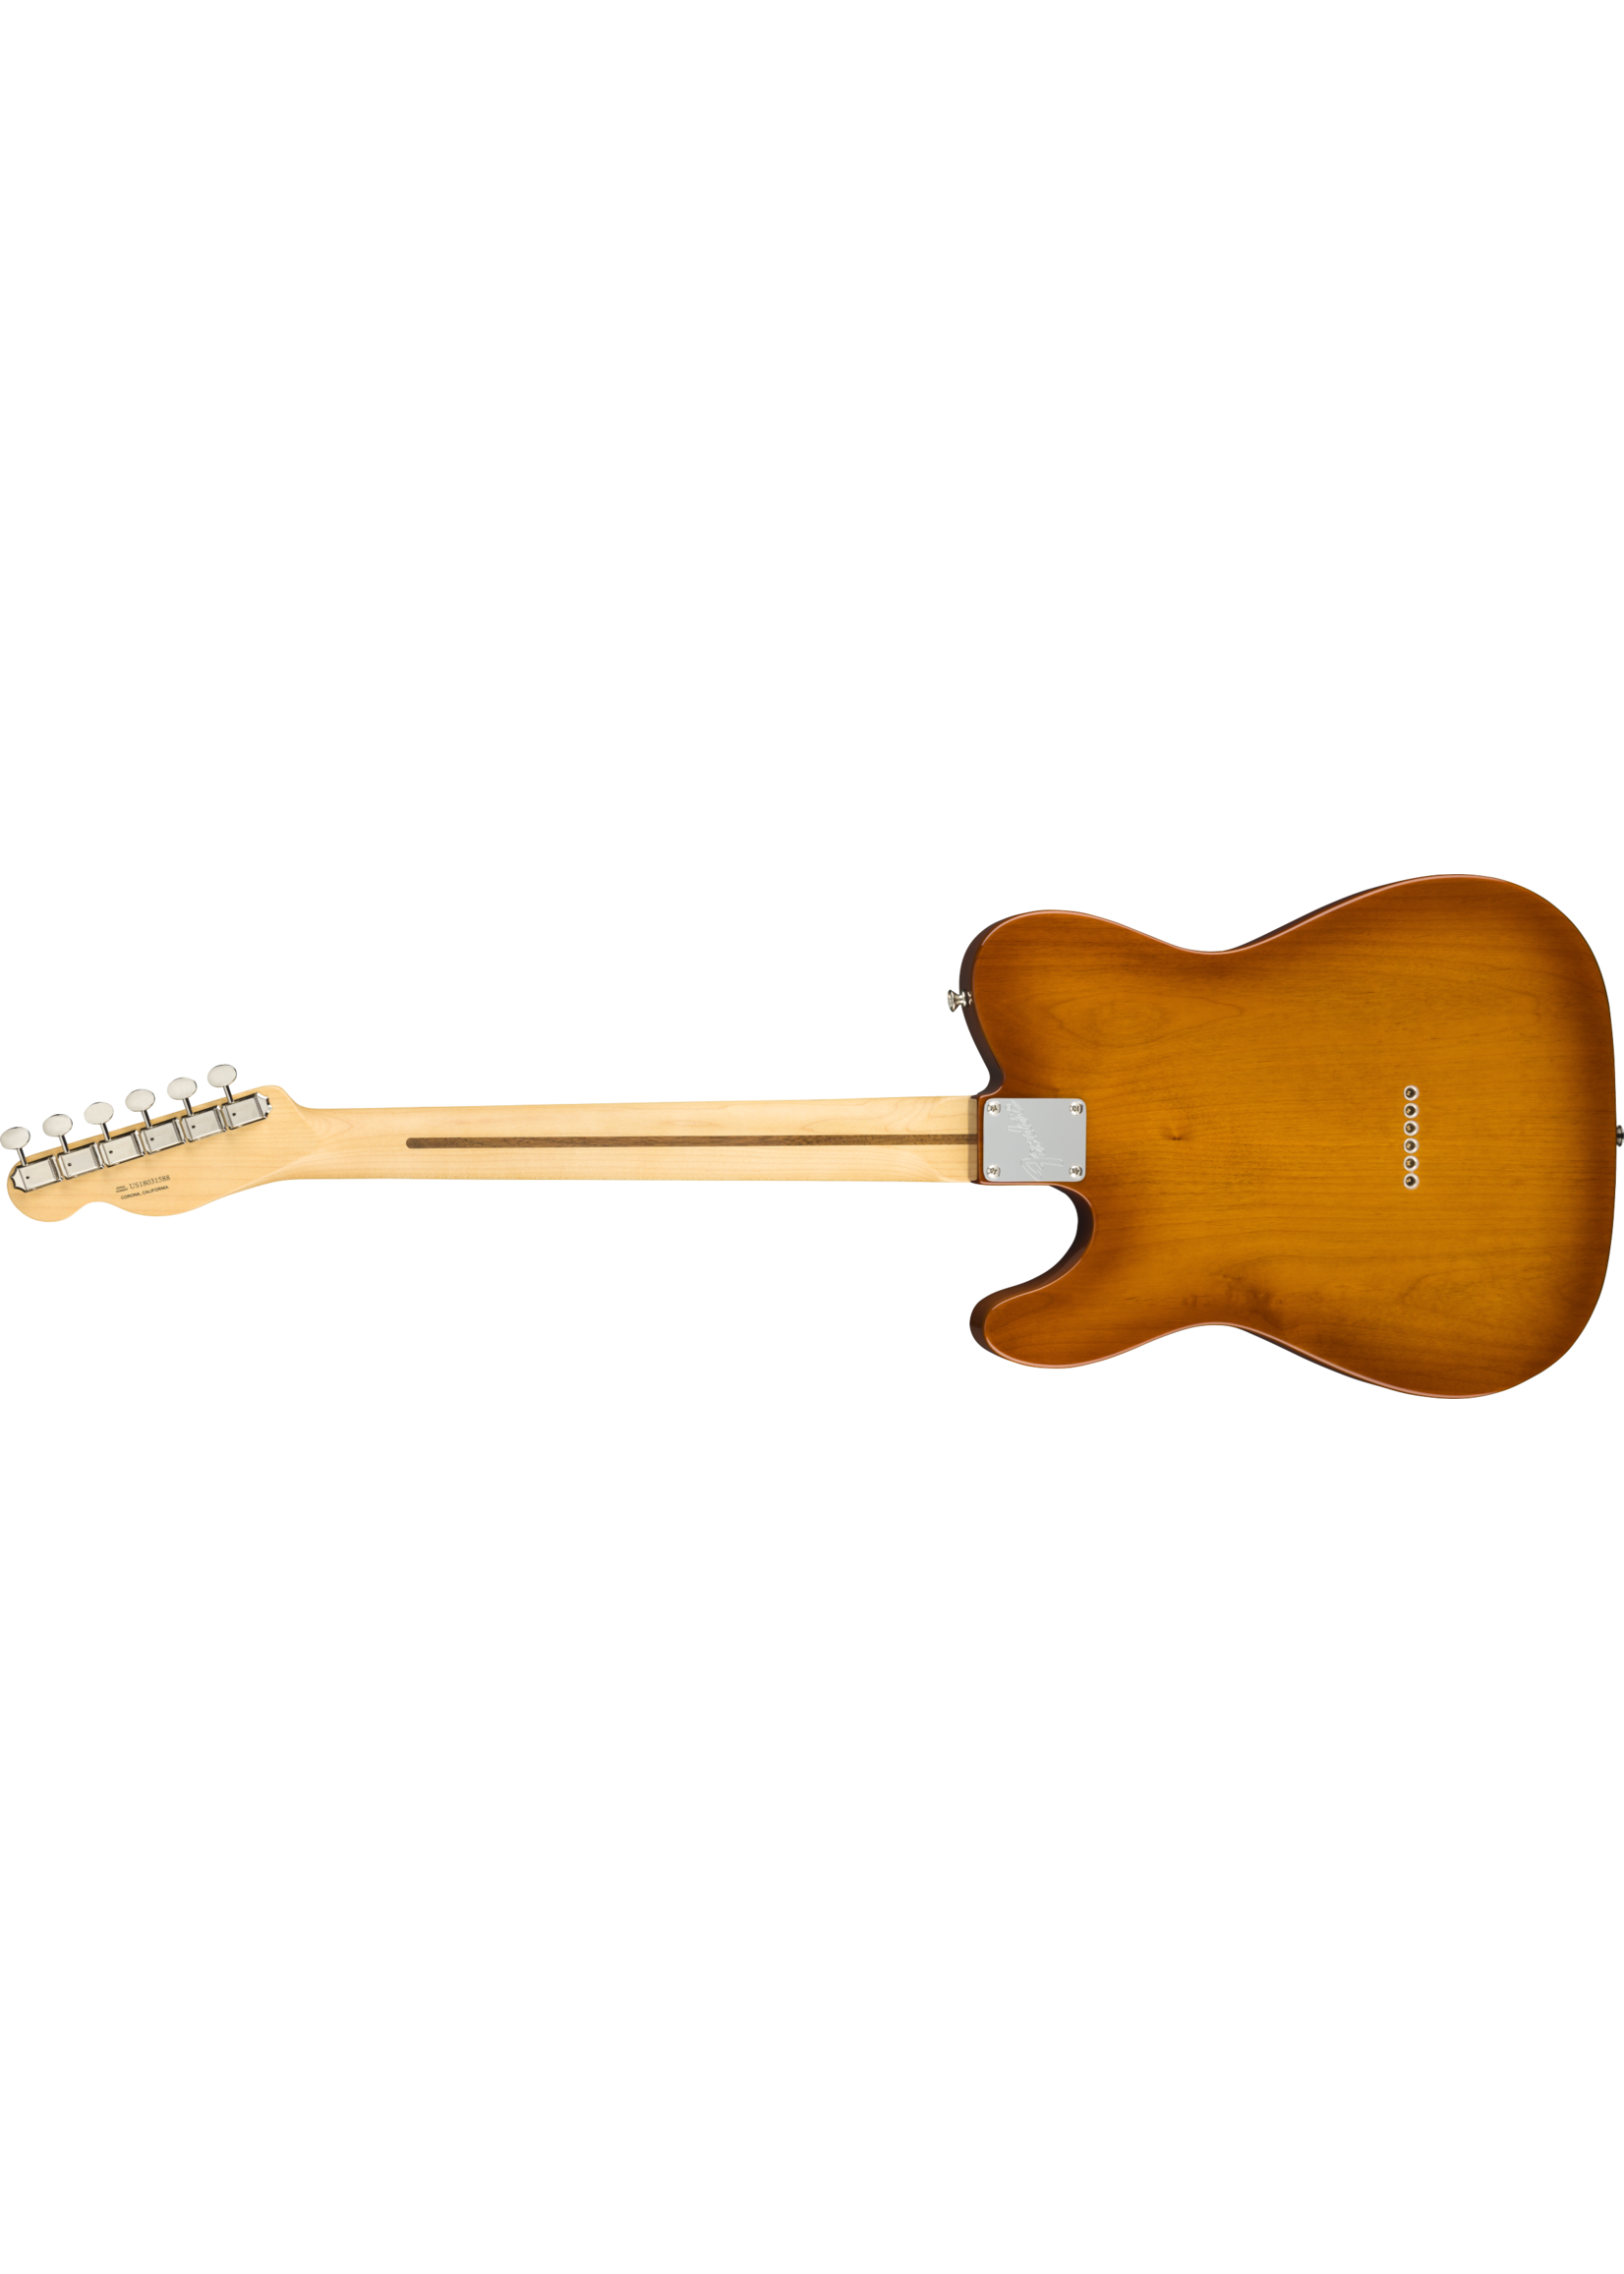 Fender Fender American Performer Telecaster with Rosewood Fretboard Honeyburst